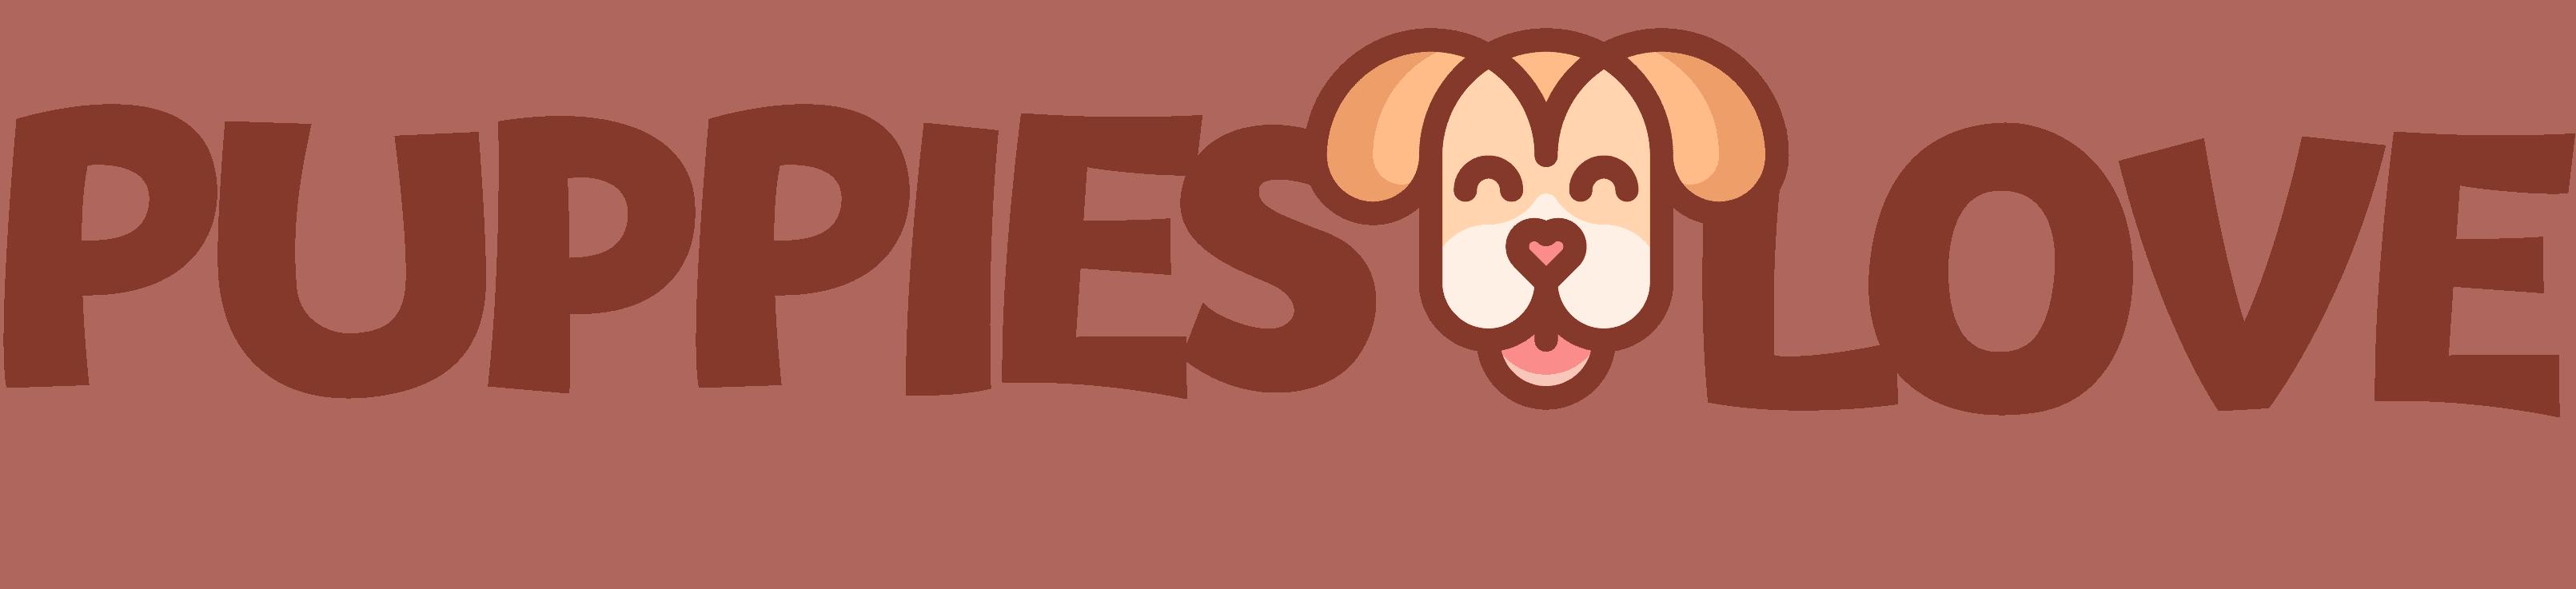 puppieslove.net